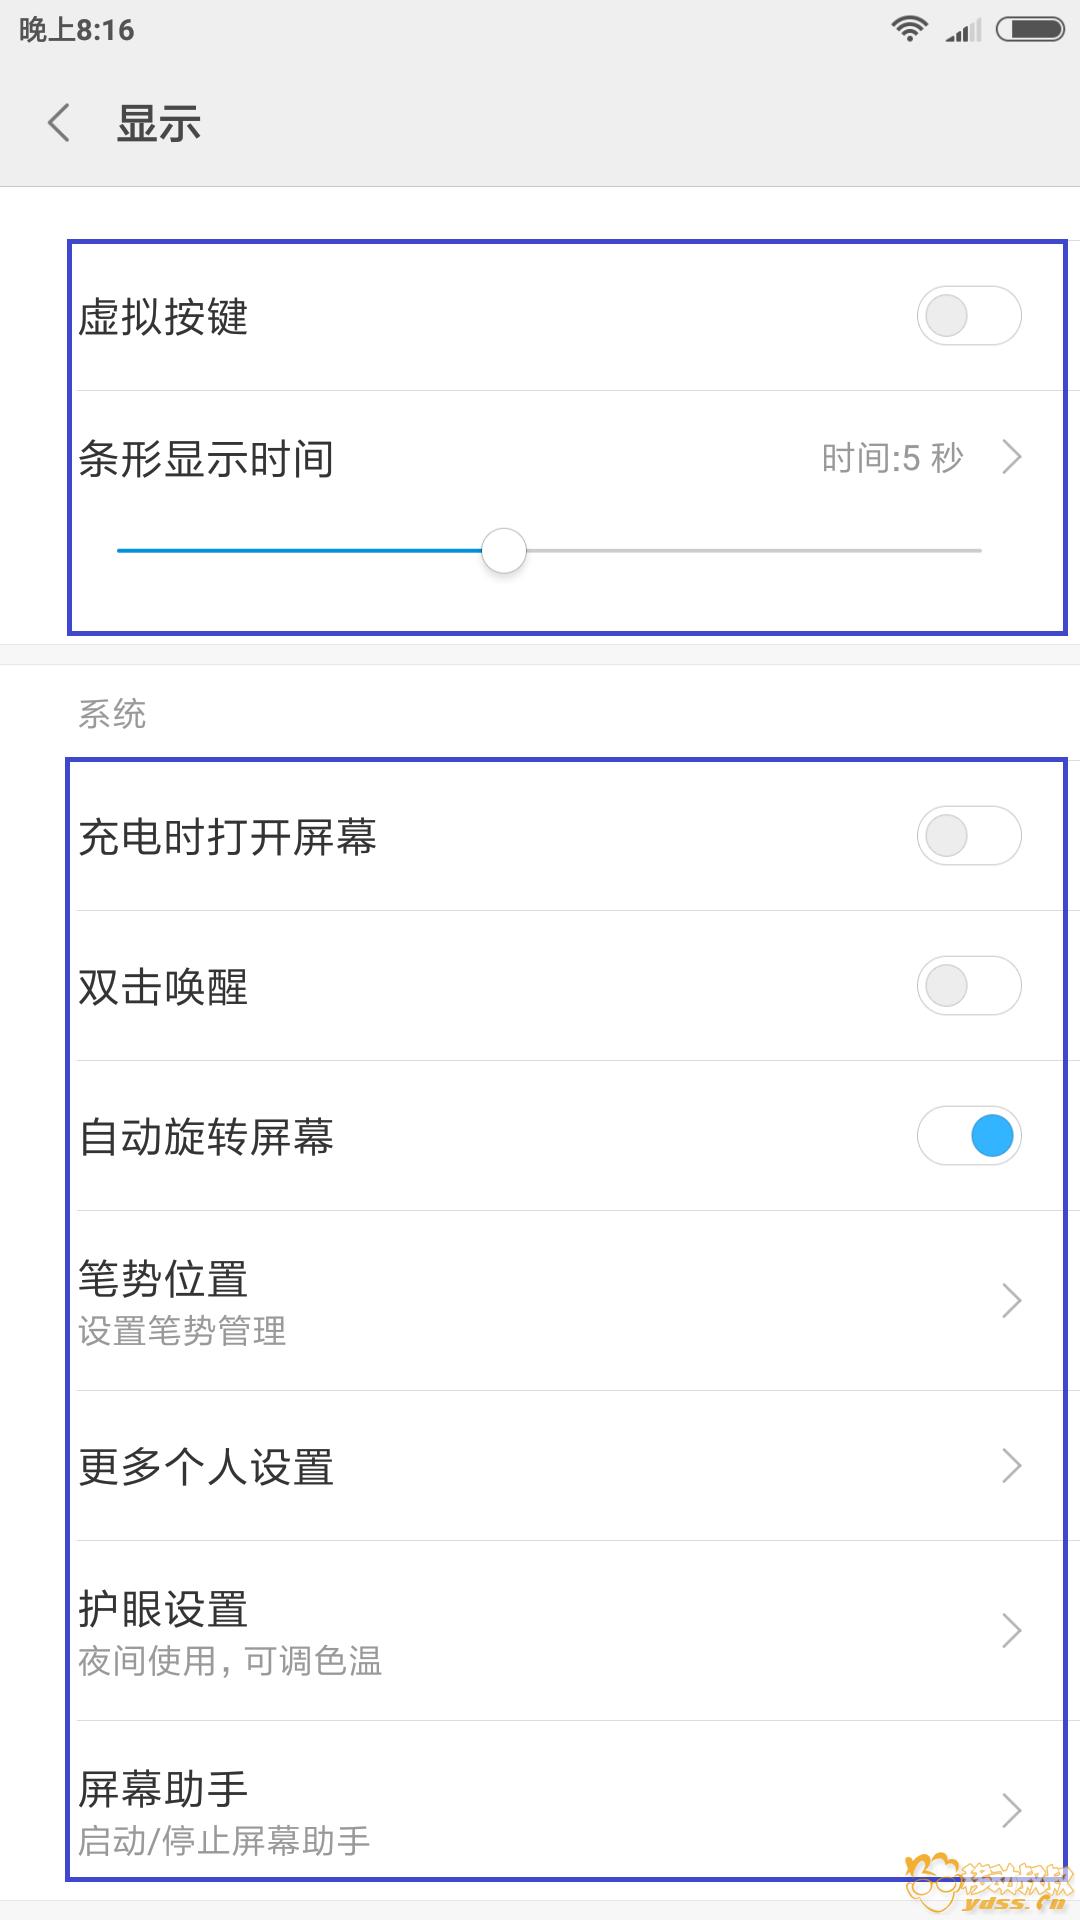 Screenshot_2018-02-28-20-16-05-295_com.android.settings.png